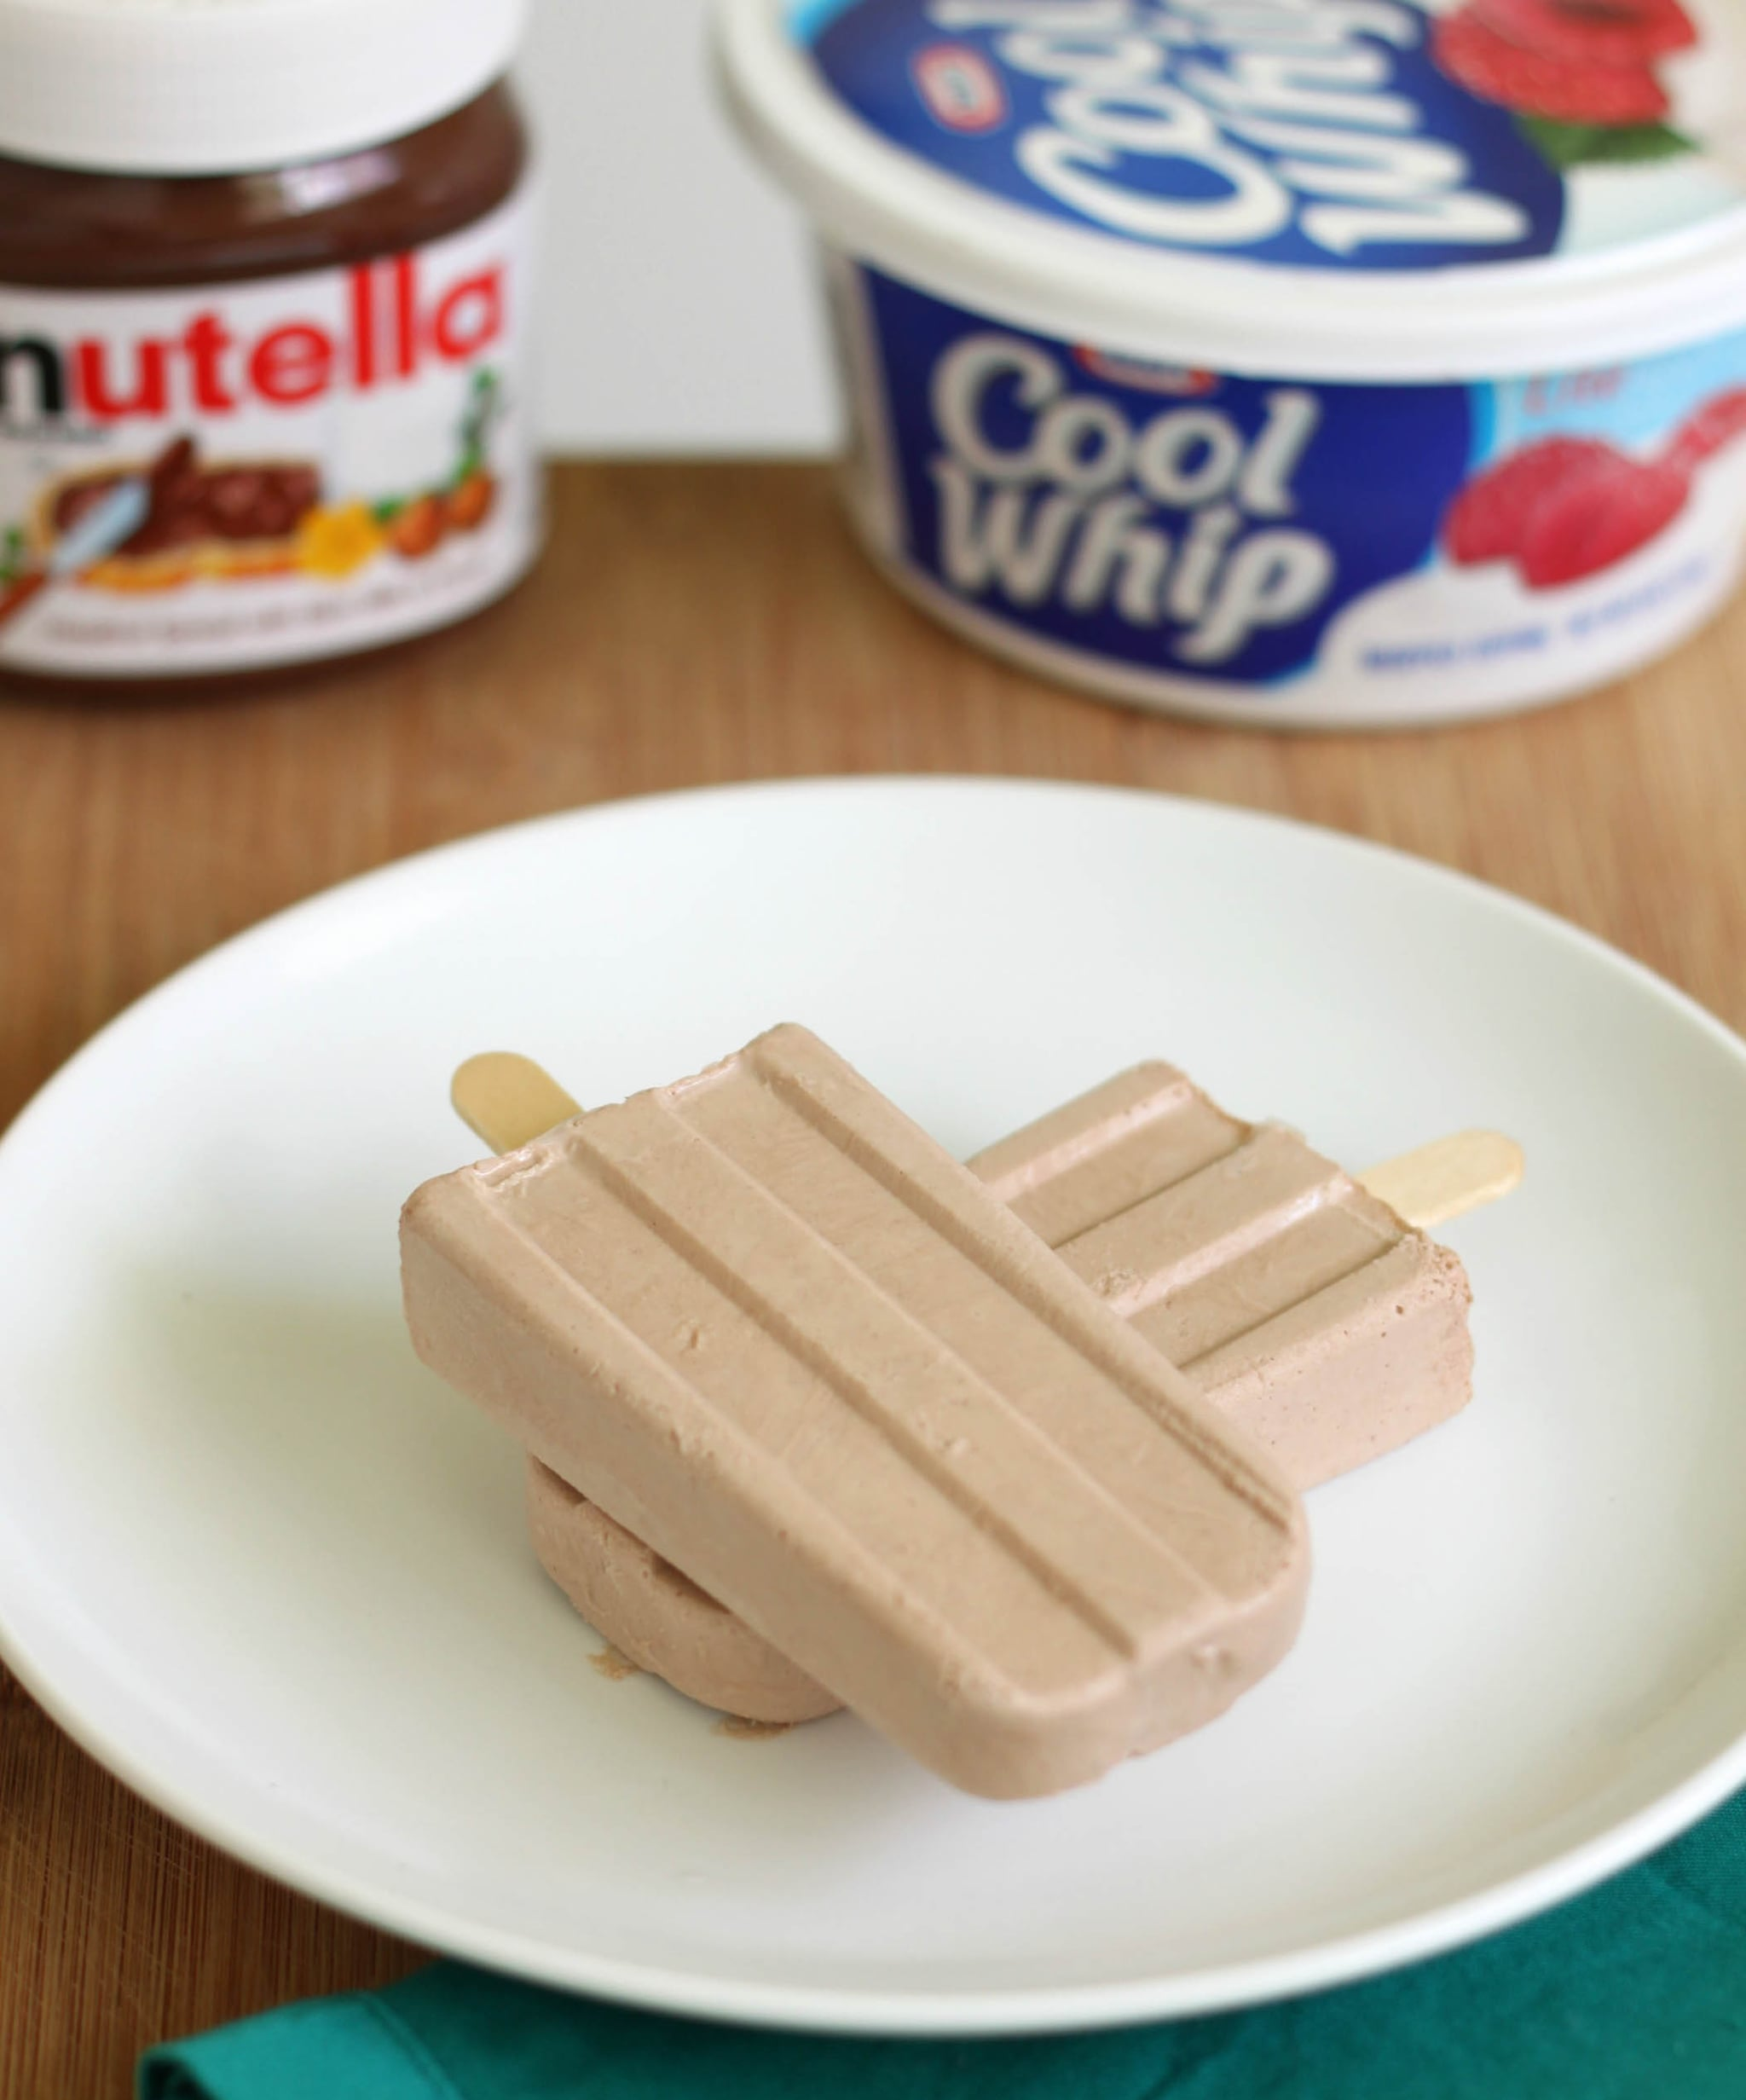 Creamy Nutella Popsicles